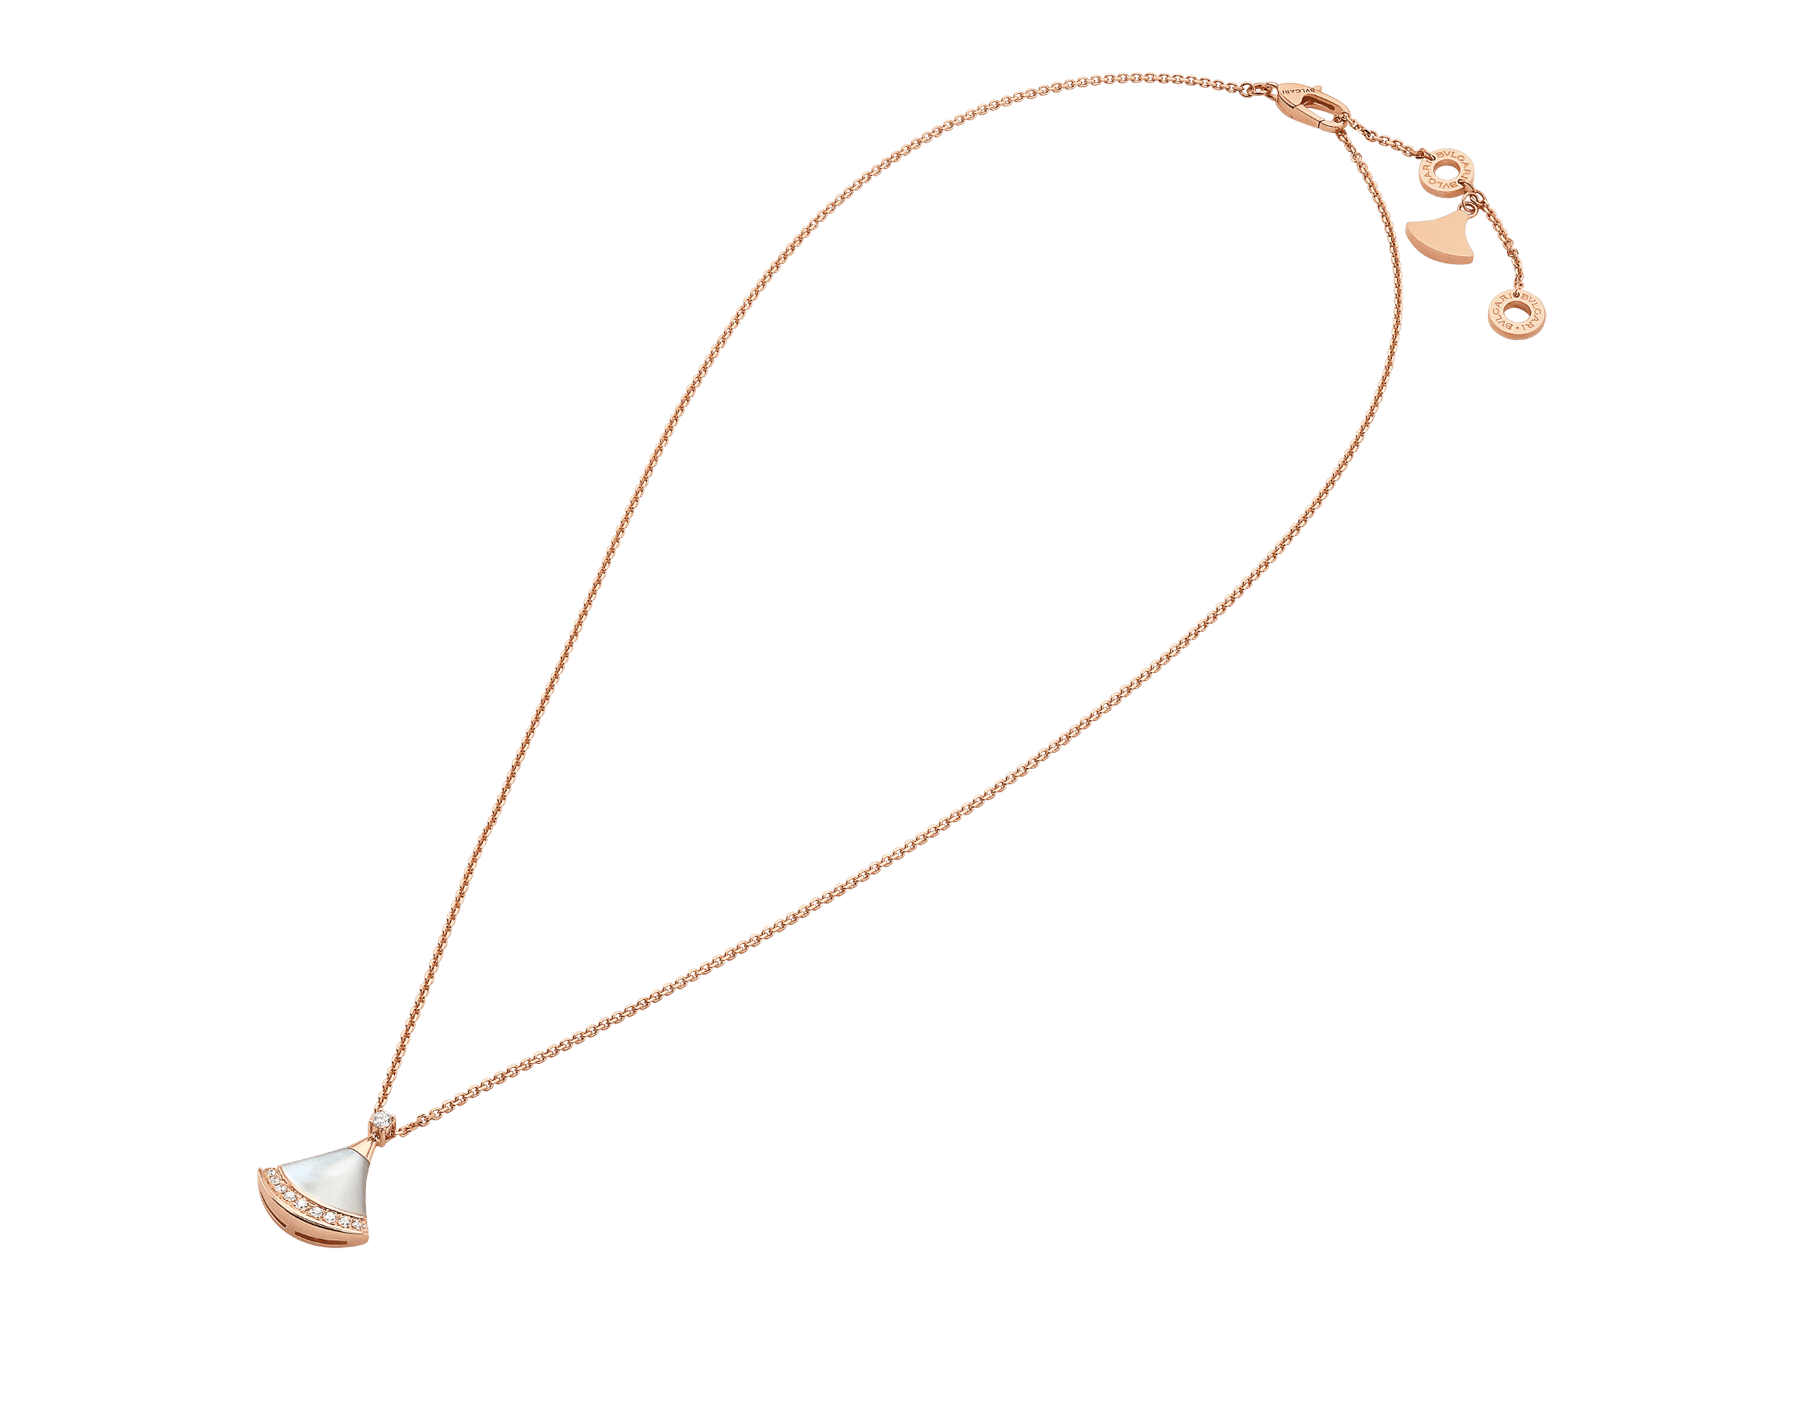 DIVAS' DREAM 18K 玫瑰金項鍊,鑲飾 1 顆鑽石(0.03 克拉)、珍珠母貝和密鑲鑽石(0.10 克拉)。 358365 image 2